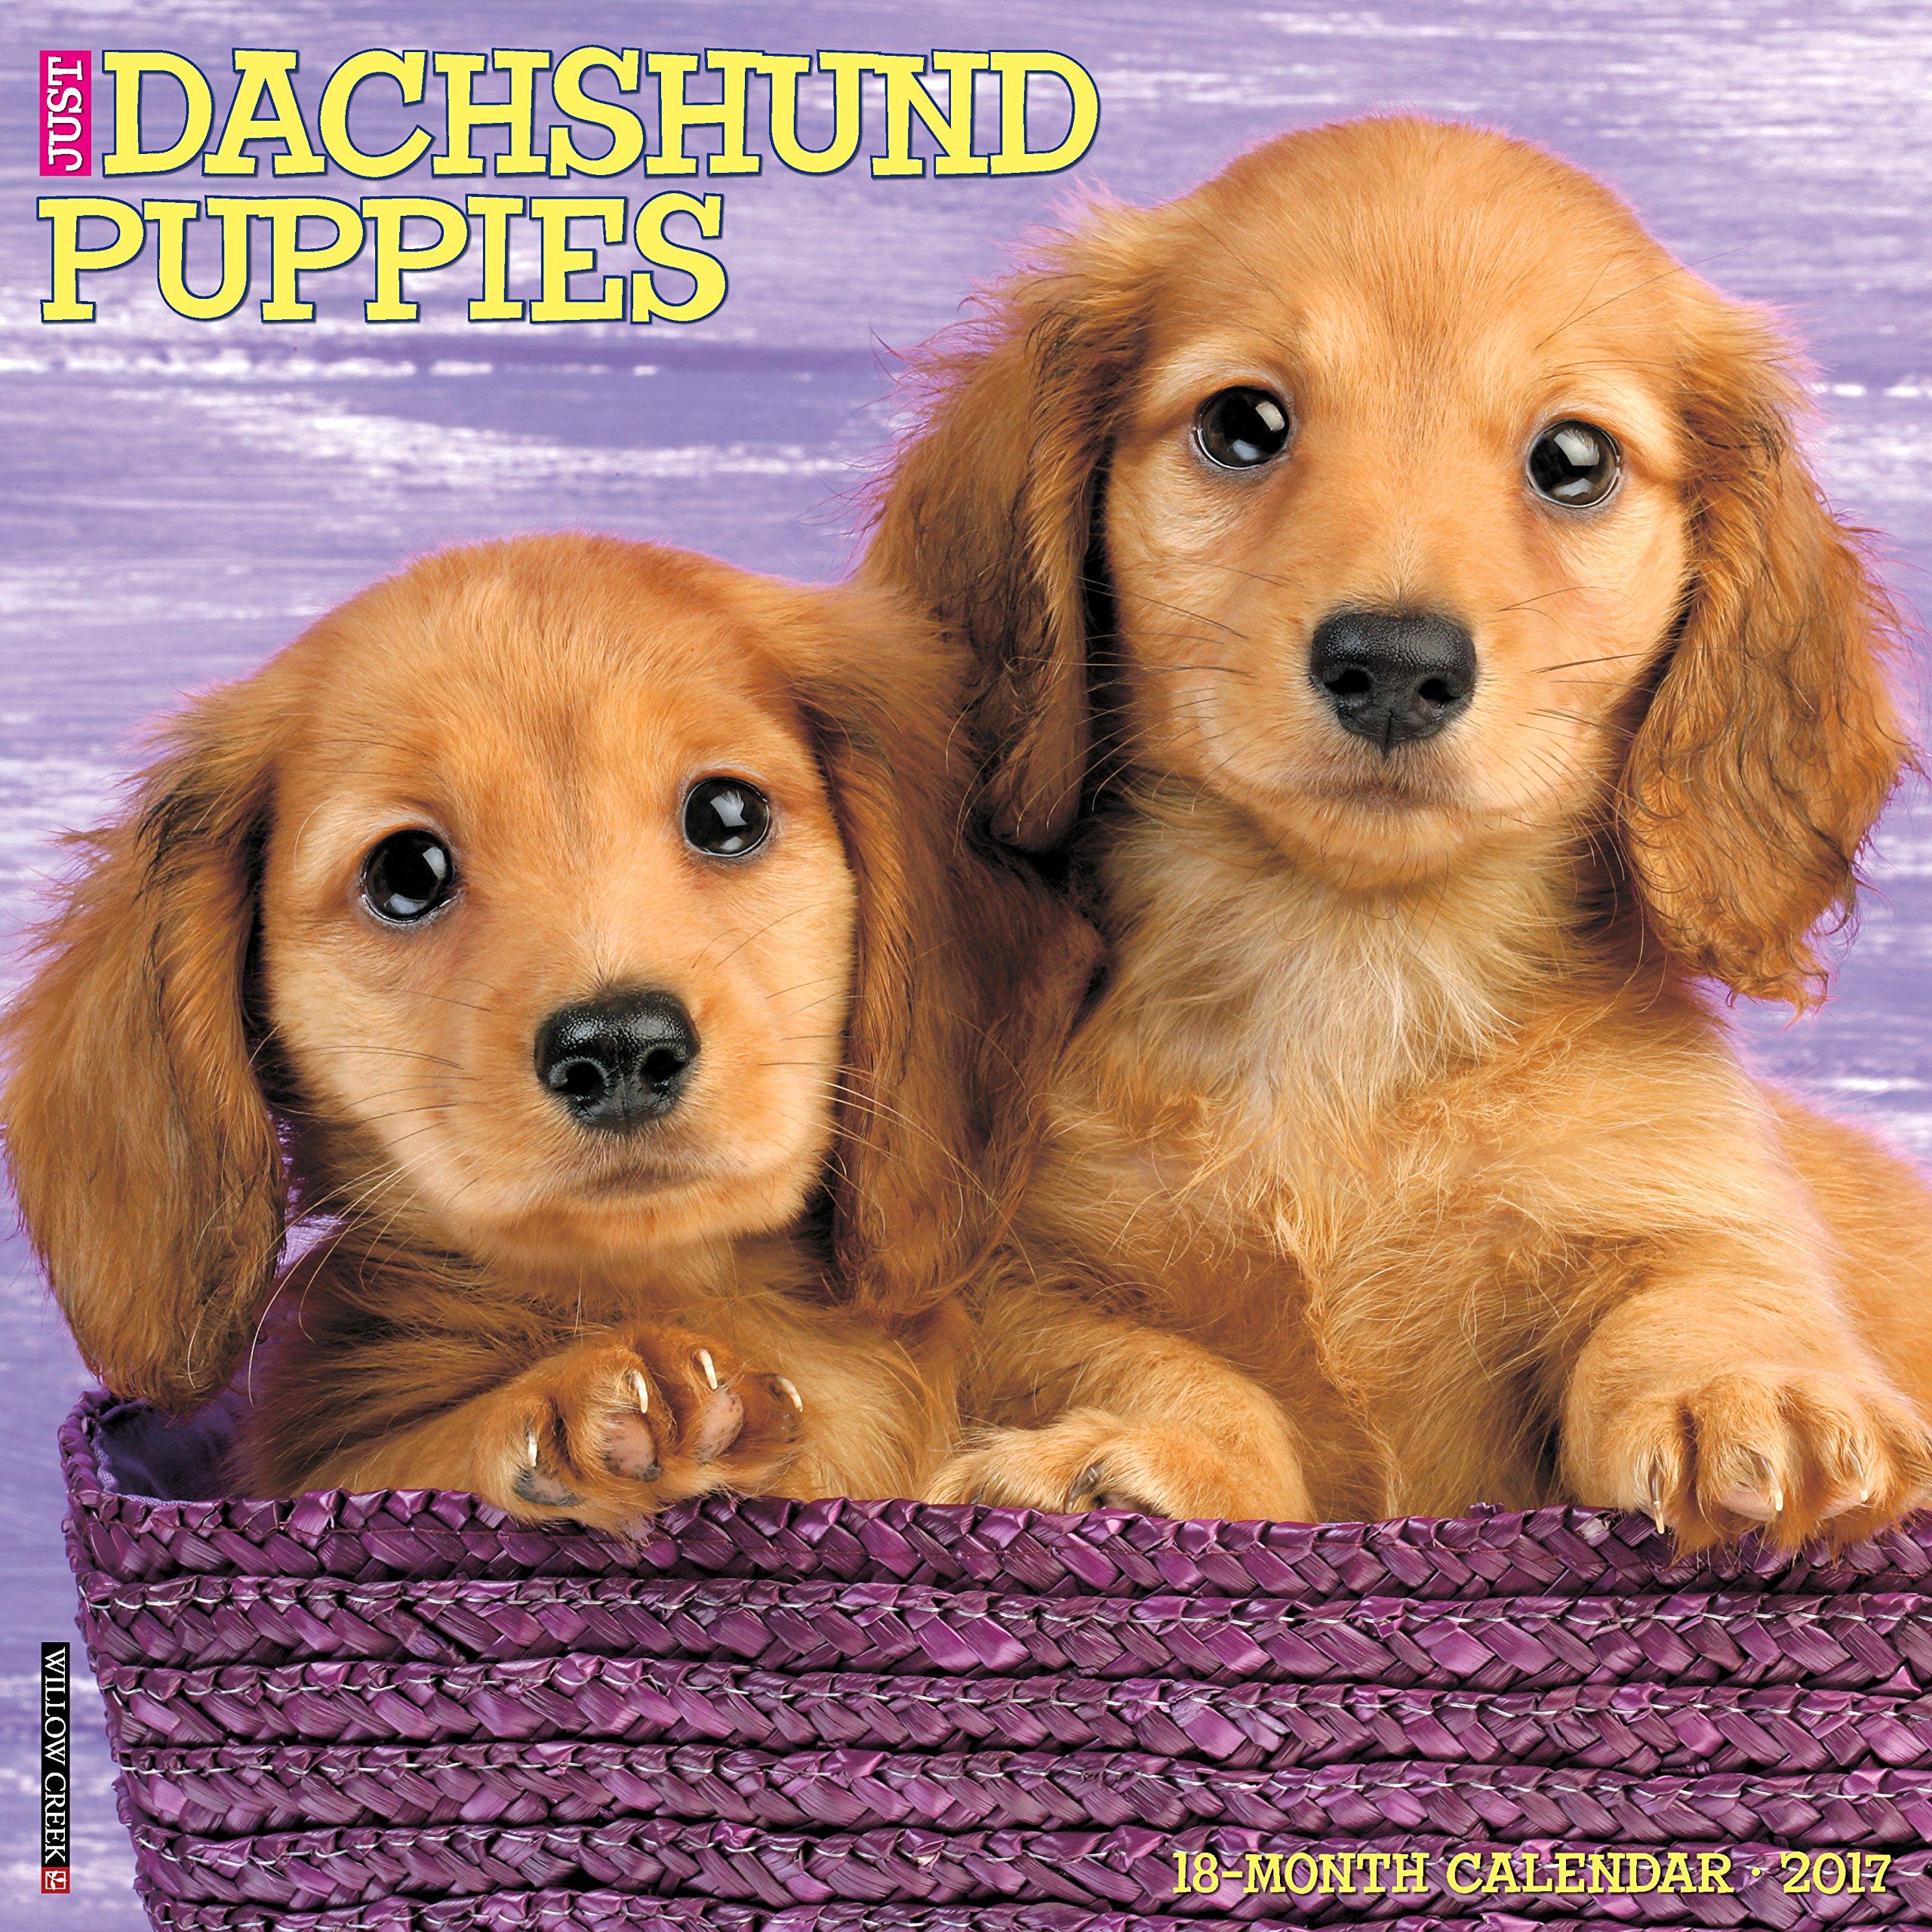 Just Dachshund Puppies 2017 Wall Calendar (Dog Breed Calendars) ebook